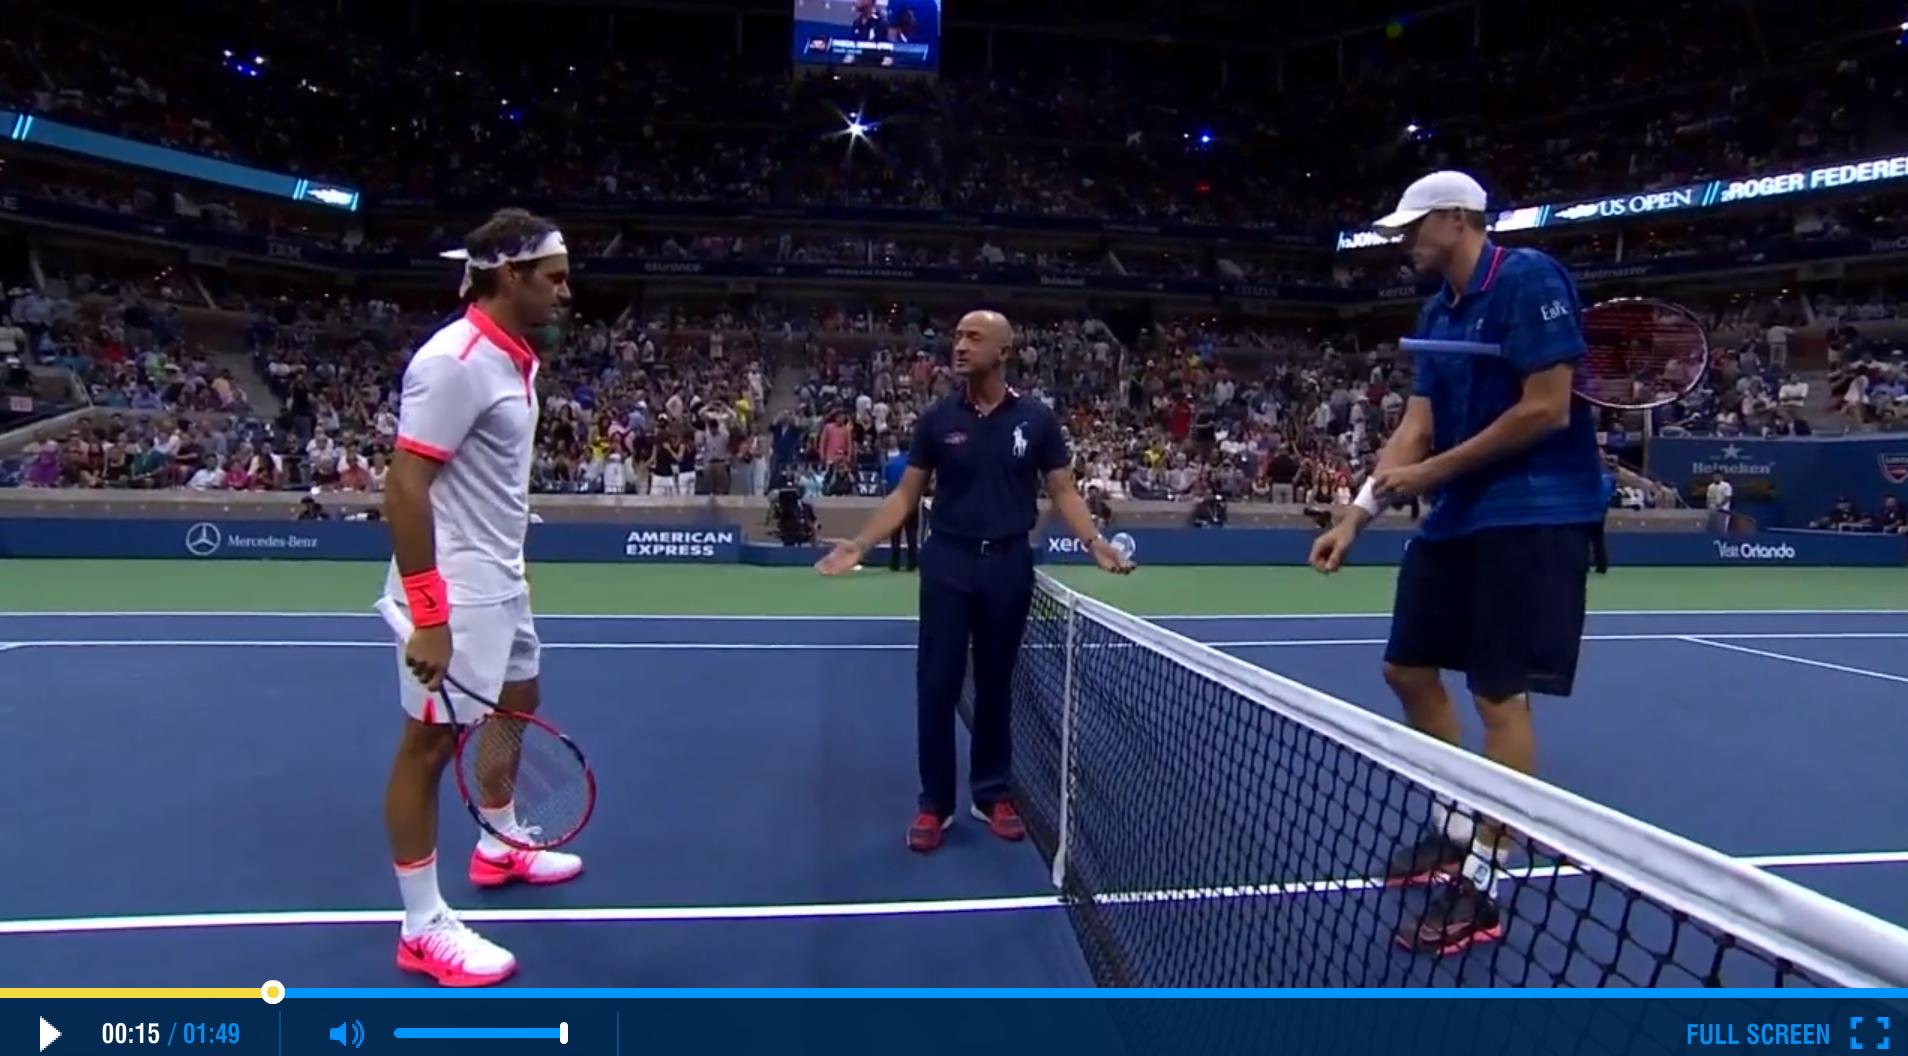 Federer 2015 US Open Fourth Round Highlights